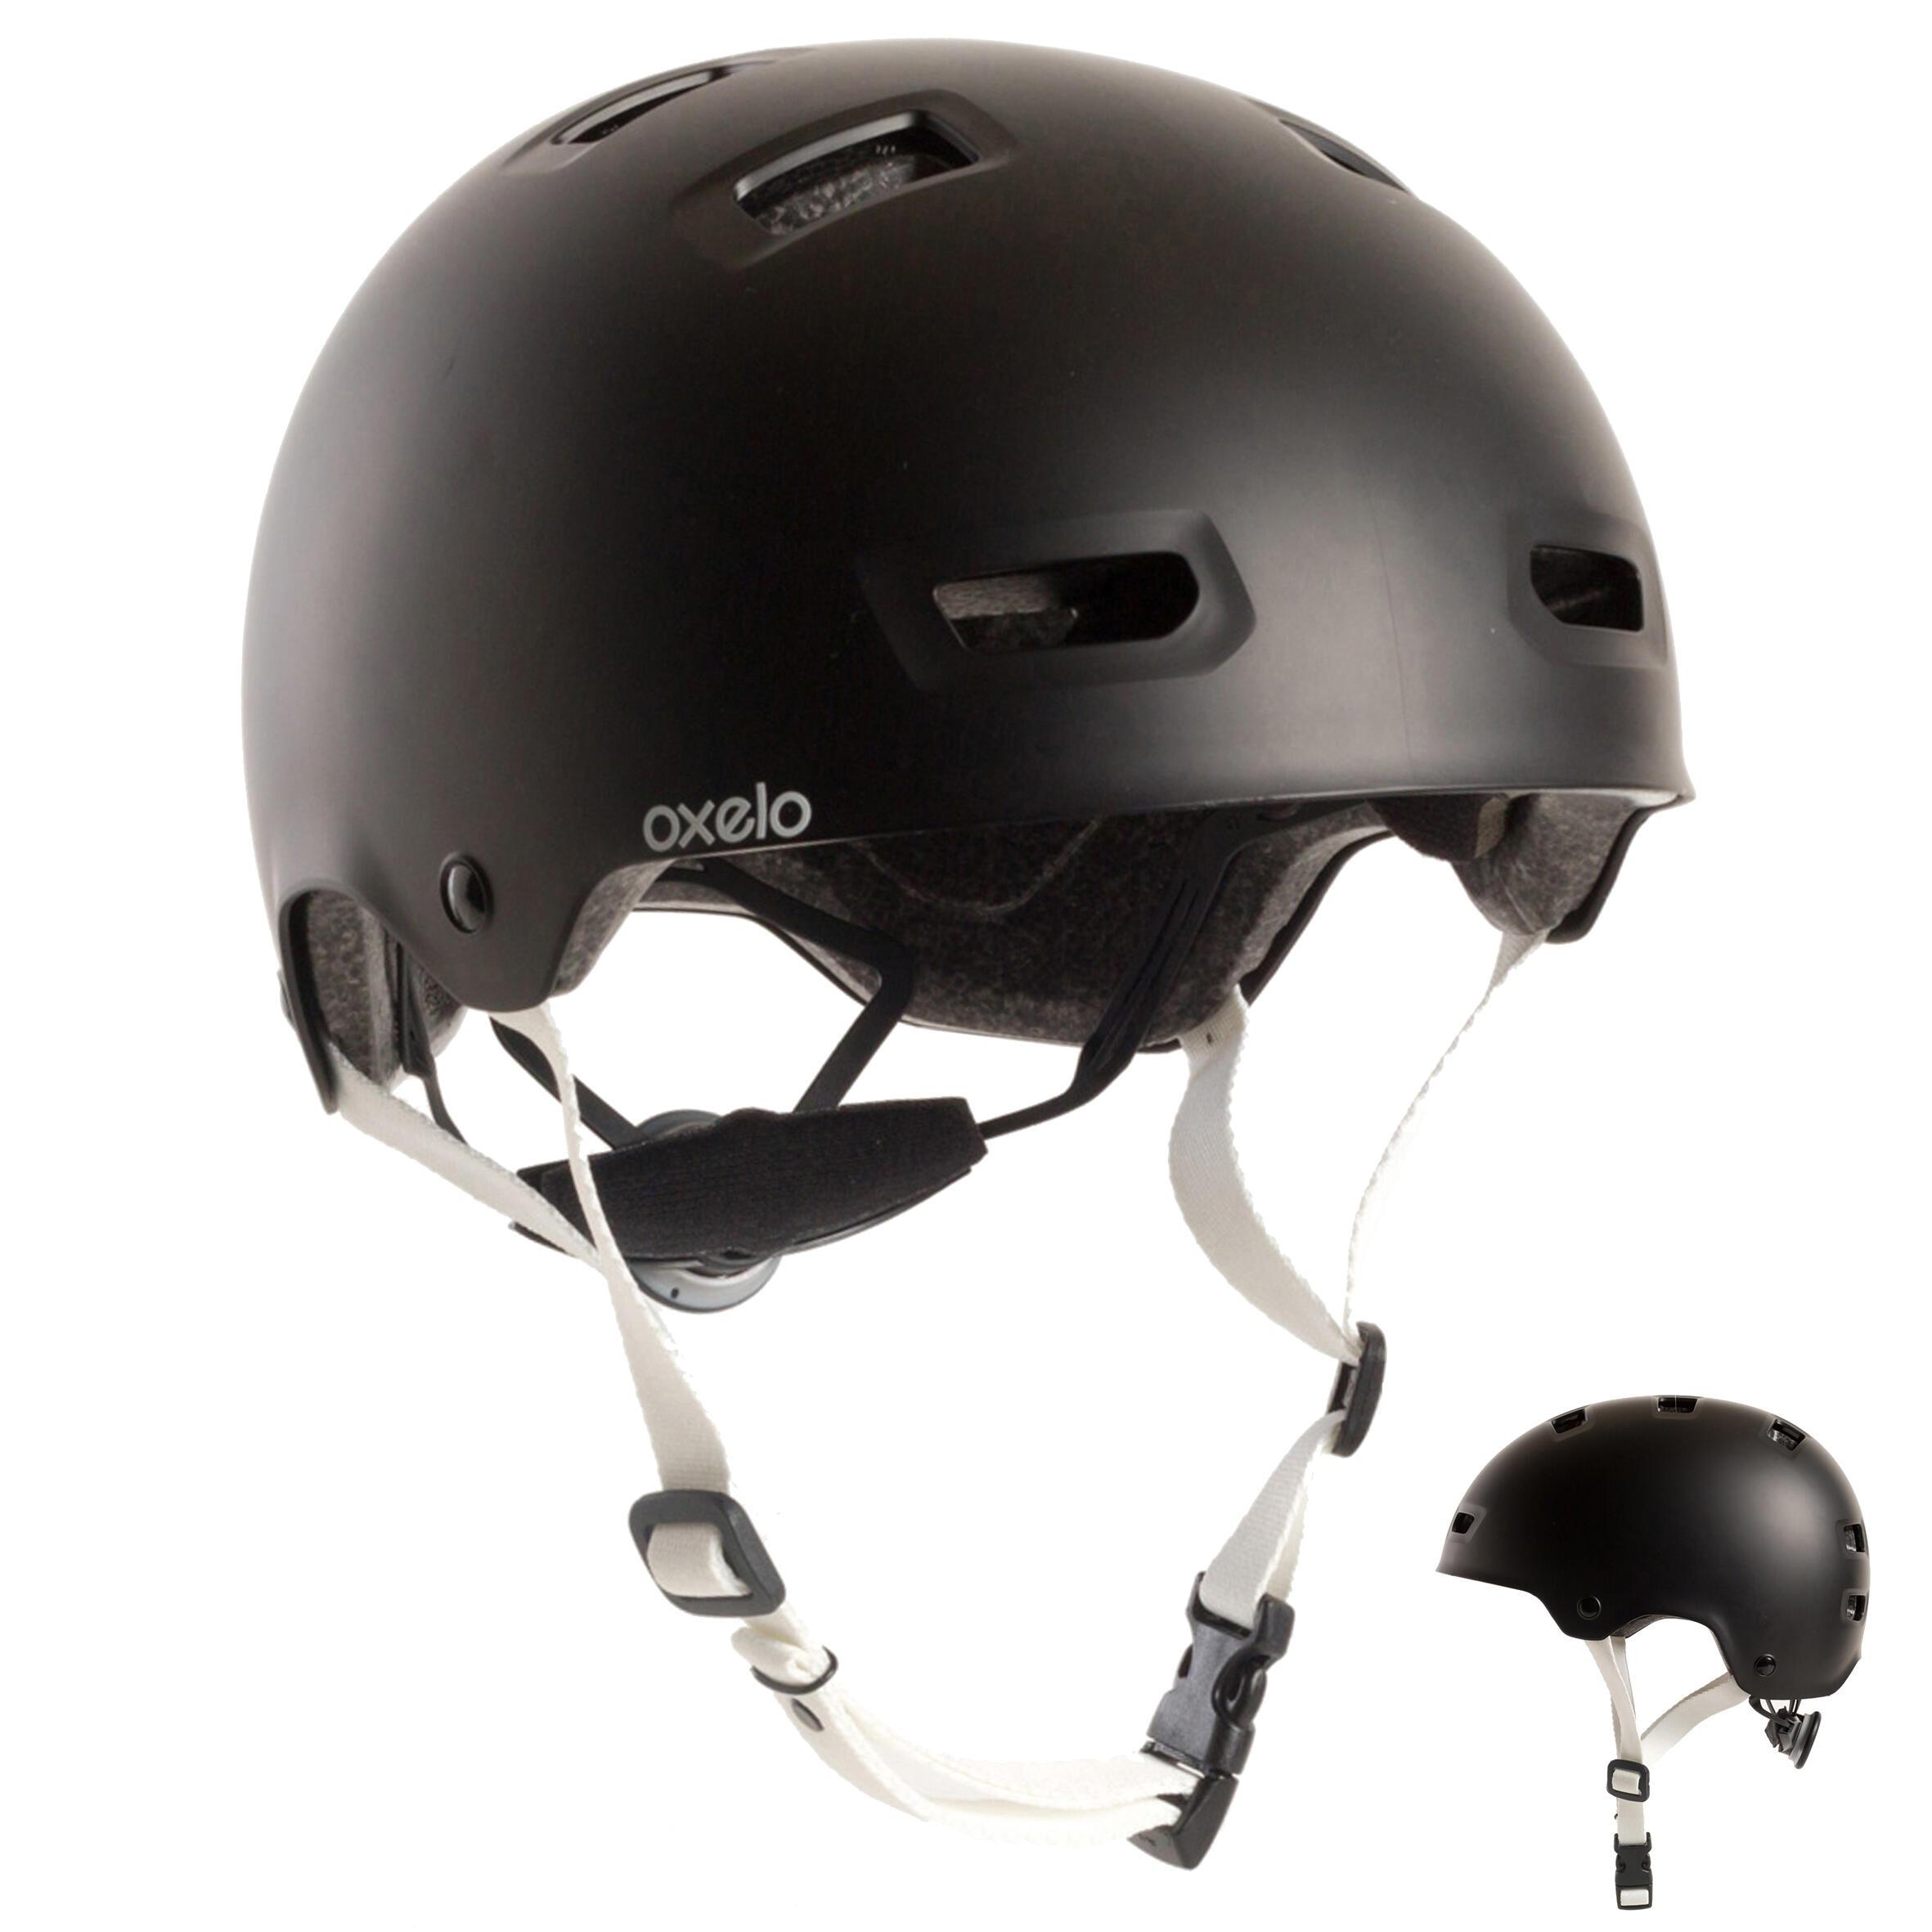 Casco para patines, patín del diablo, patineta, bicicleta MF500 negro